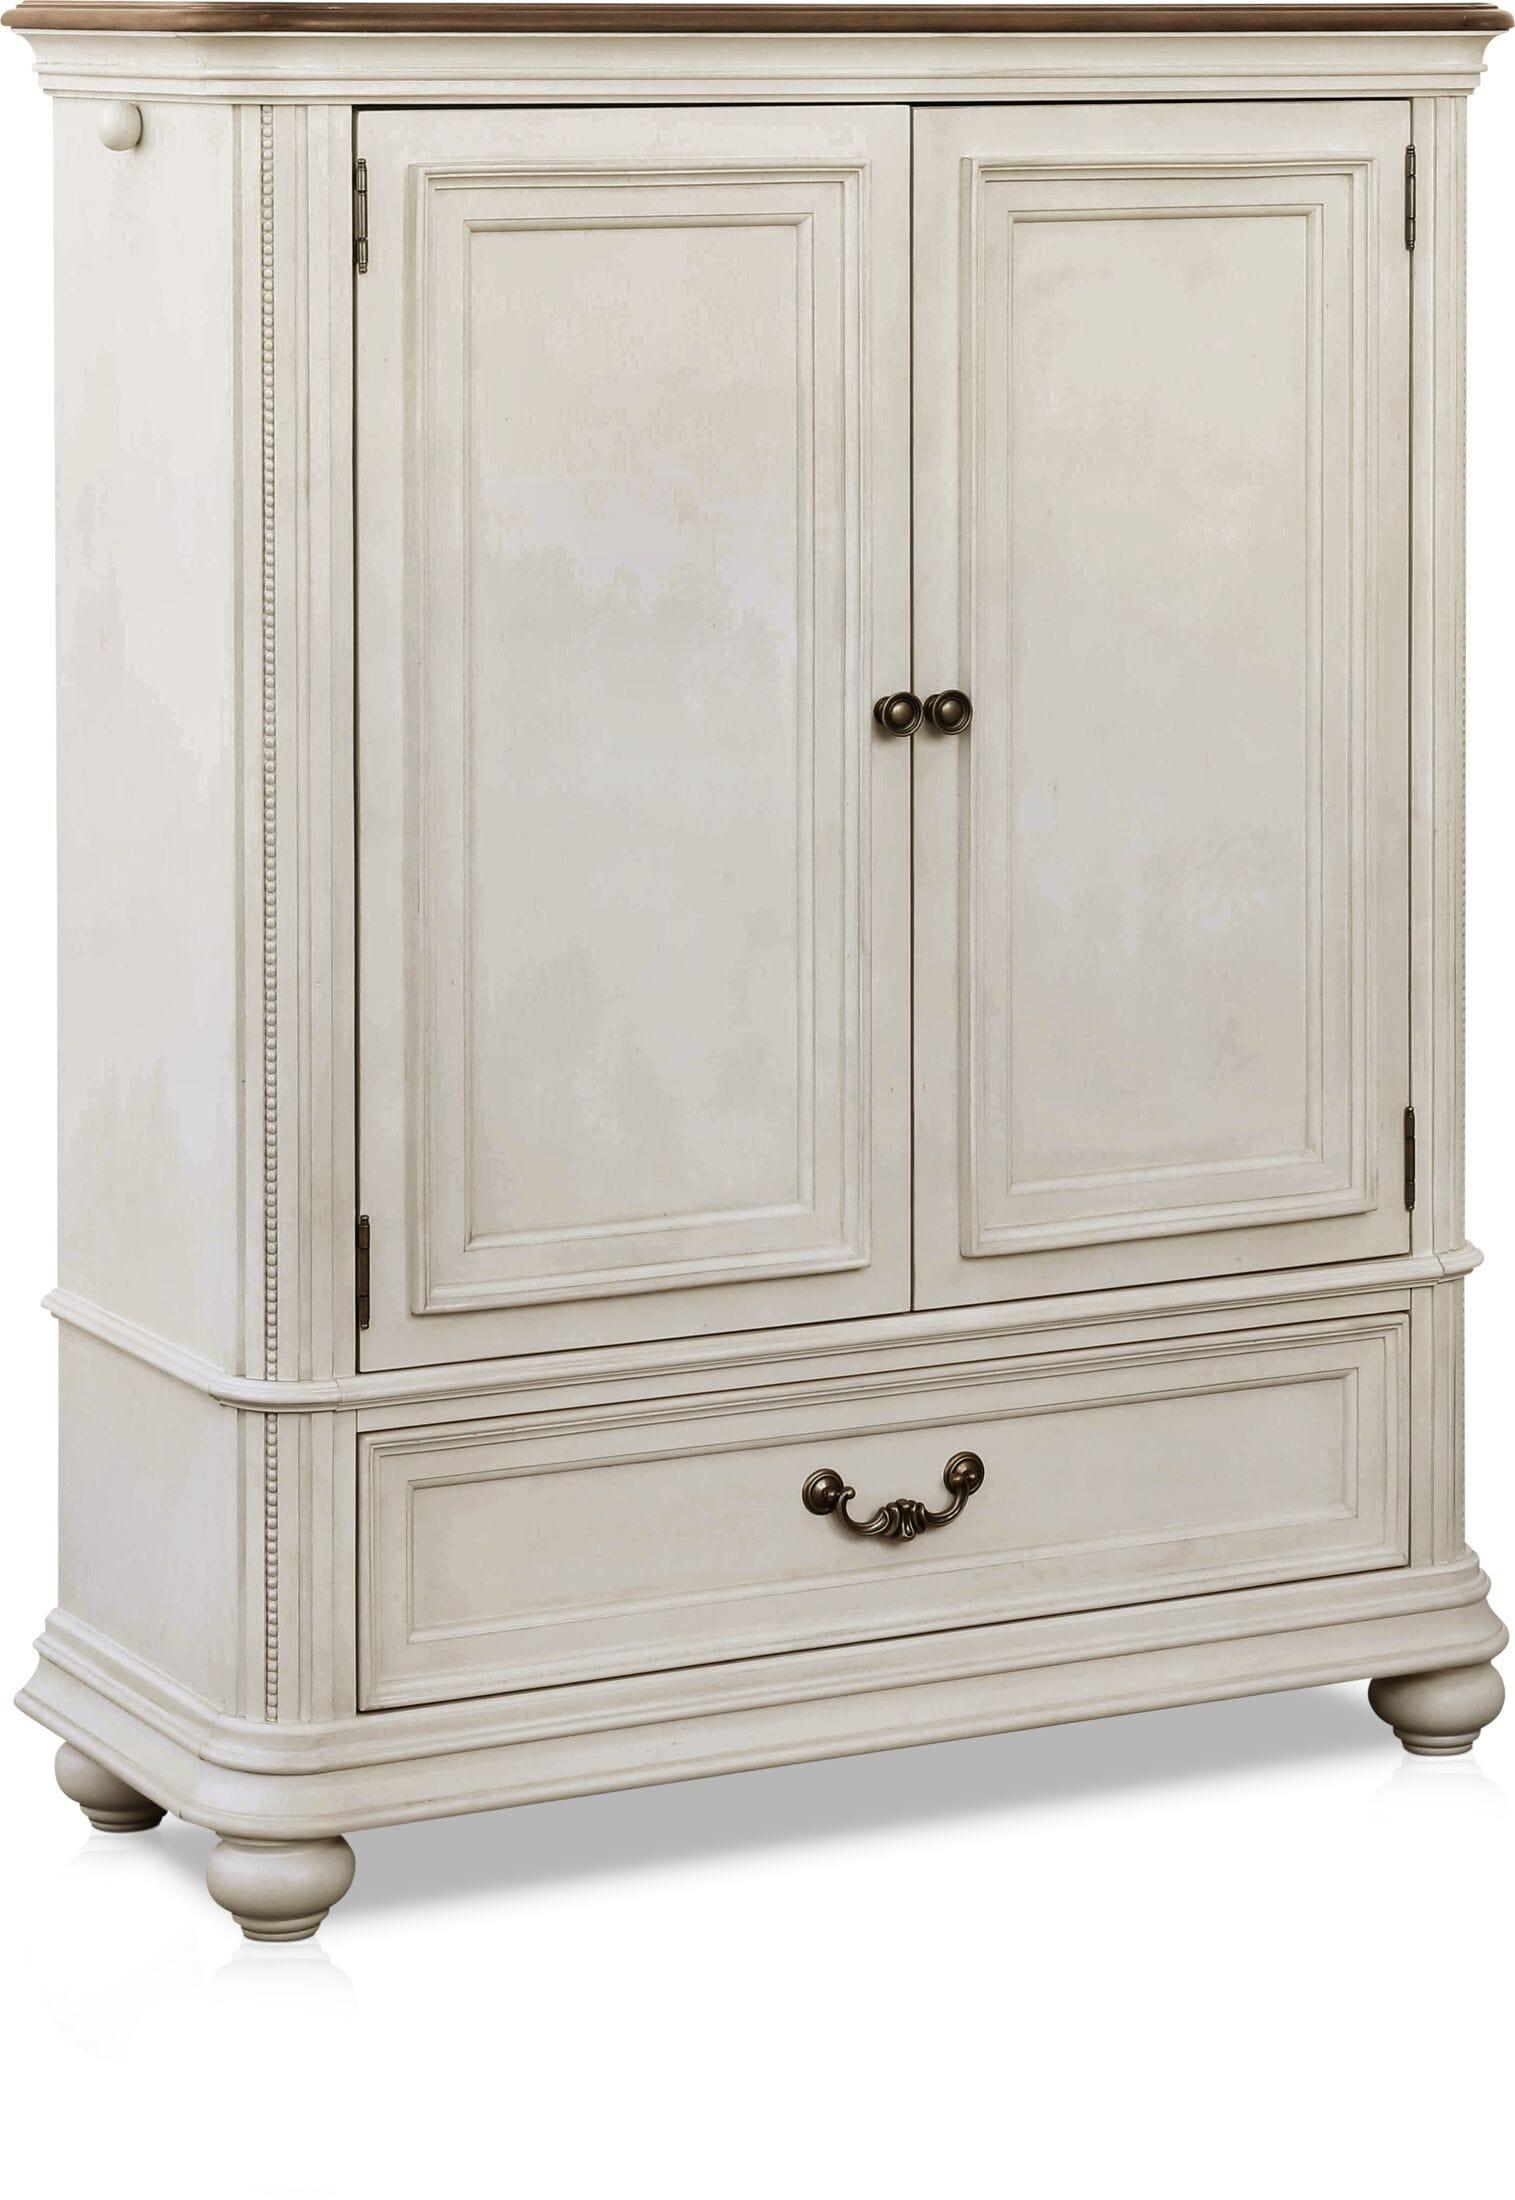 Bedroom Furniture - Mayfair Armoire